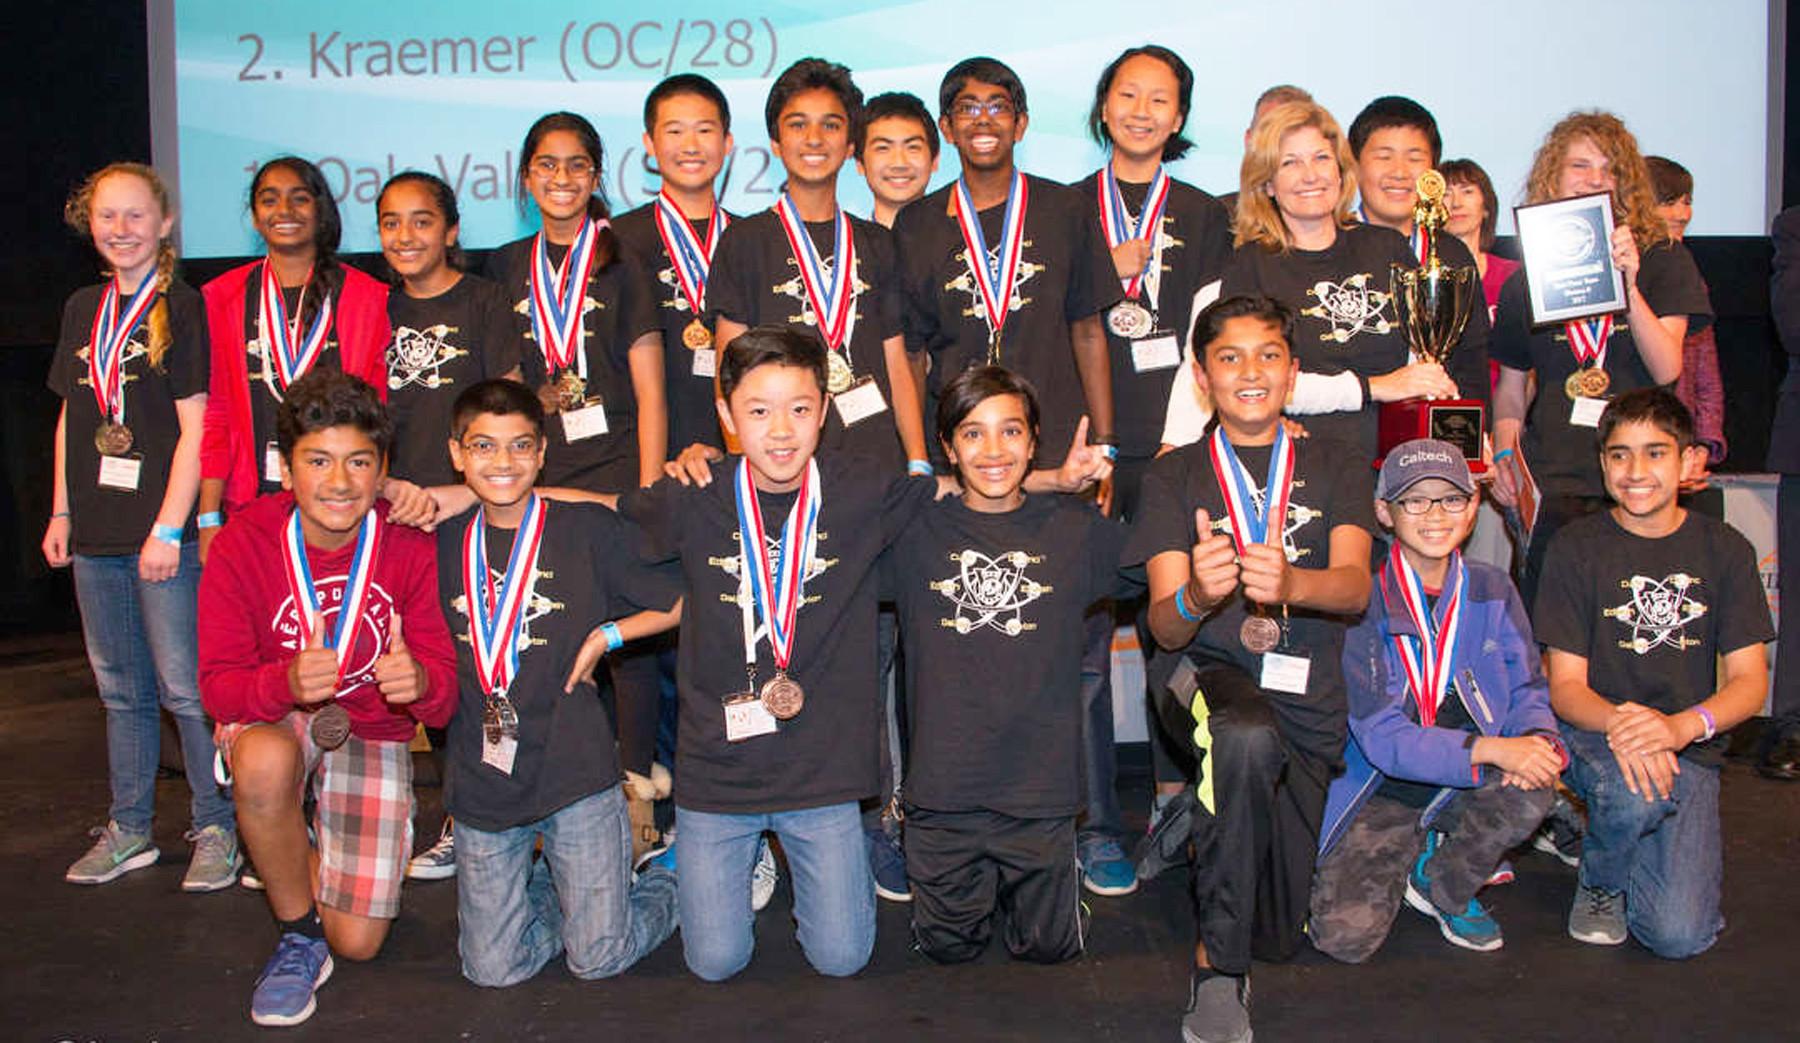 Oak Valley students headed to national Science Olympiad - Pomerado News